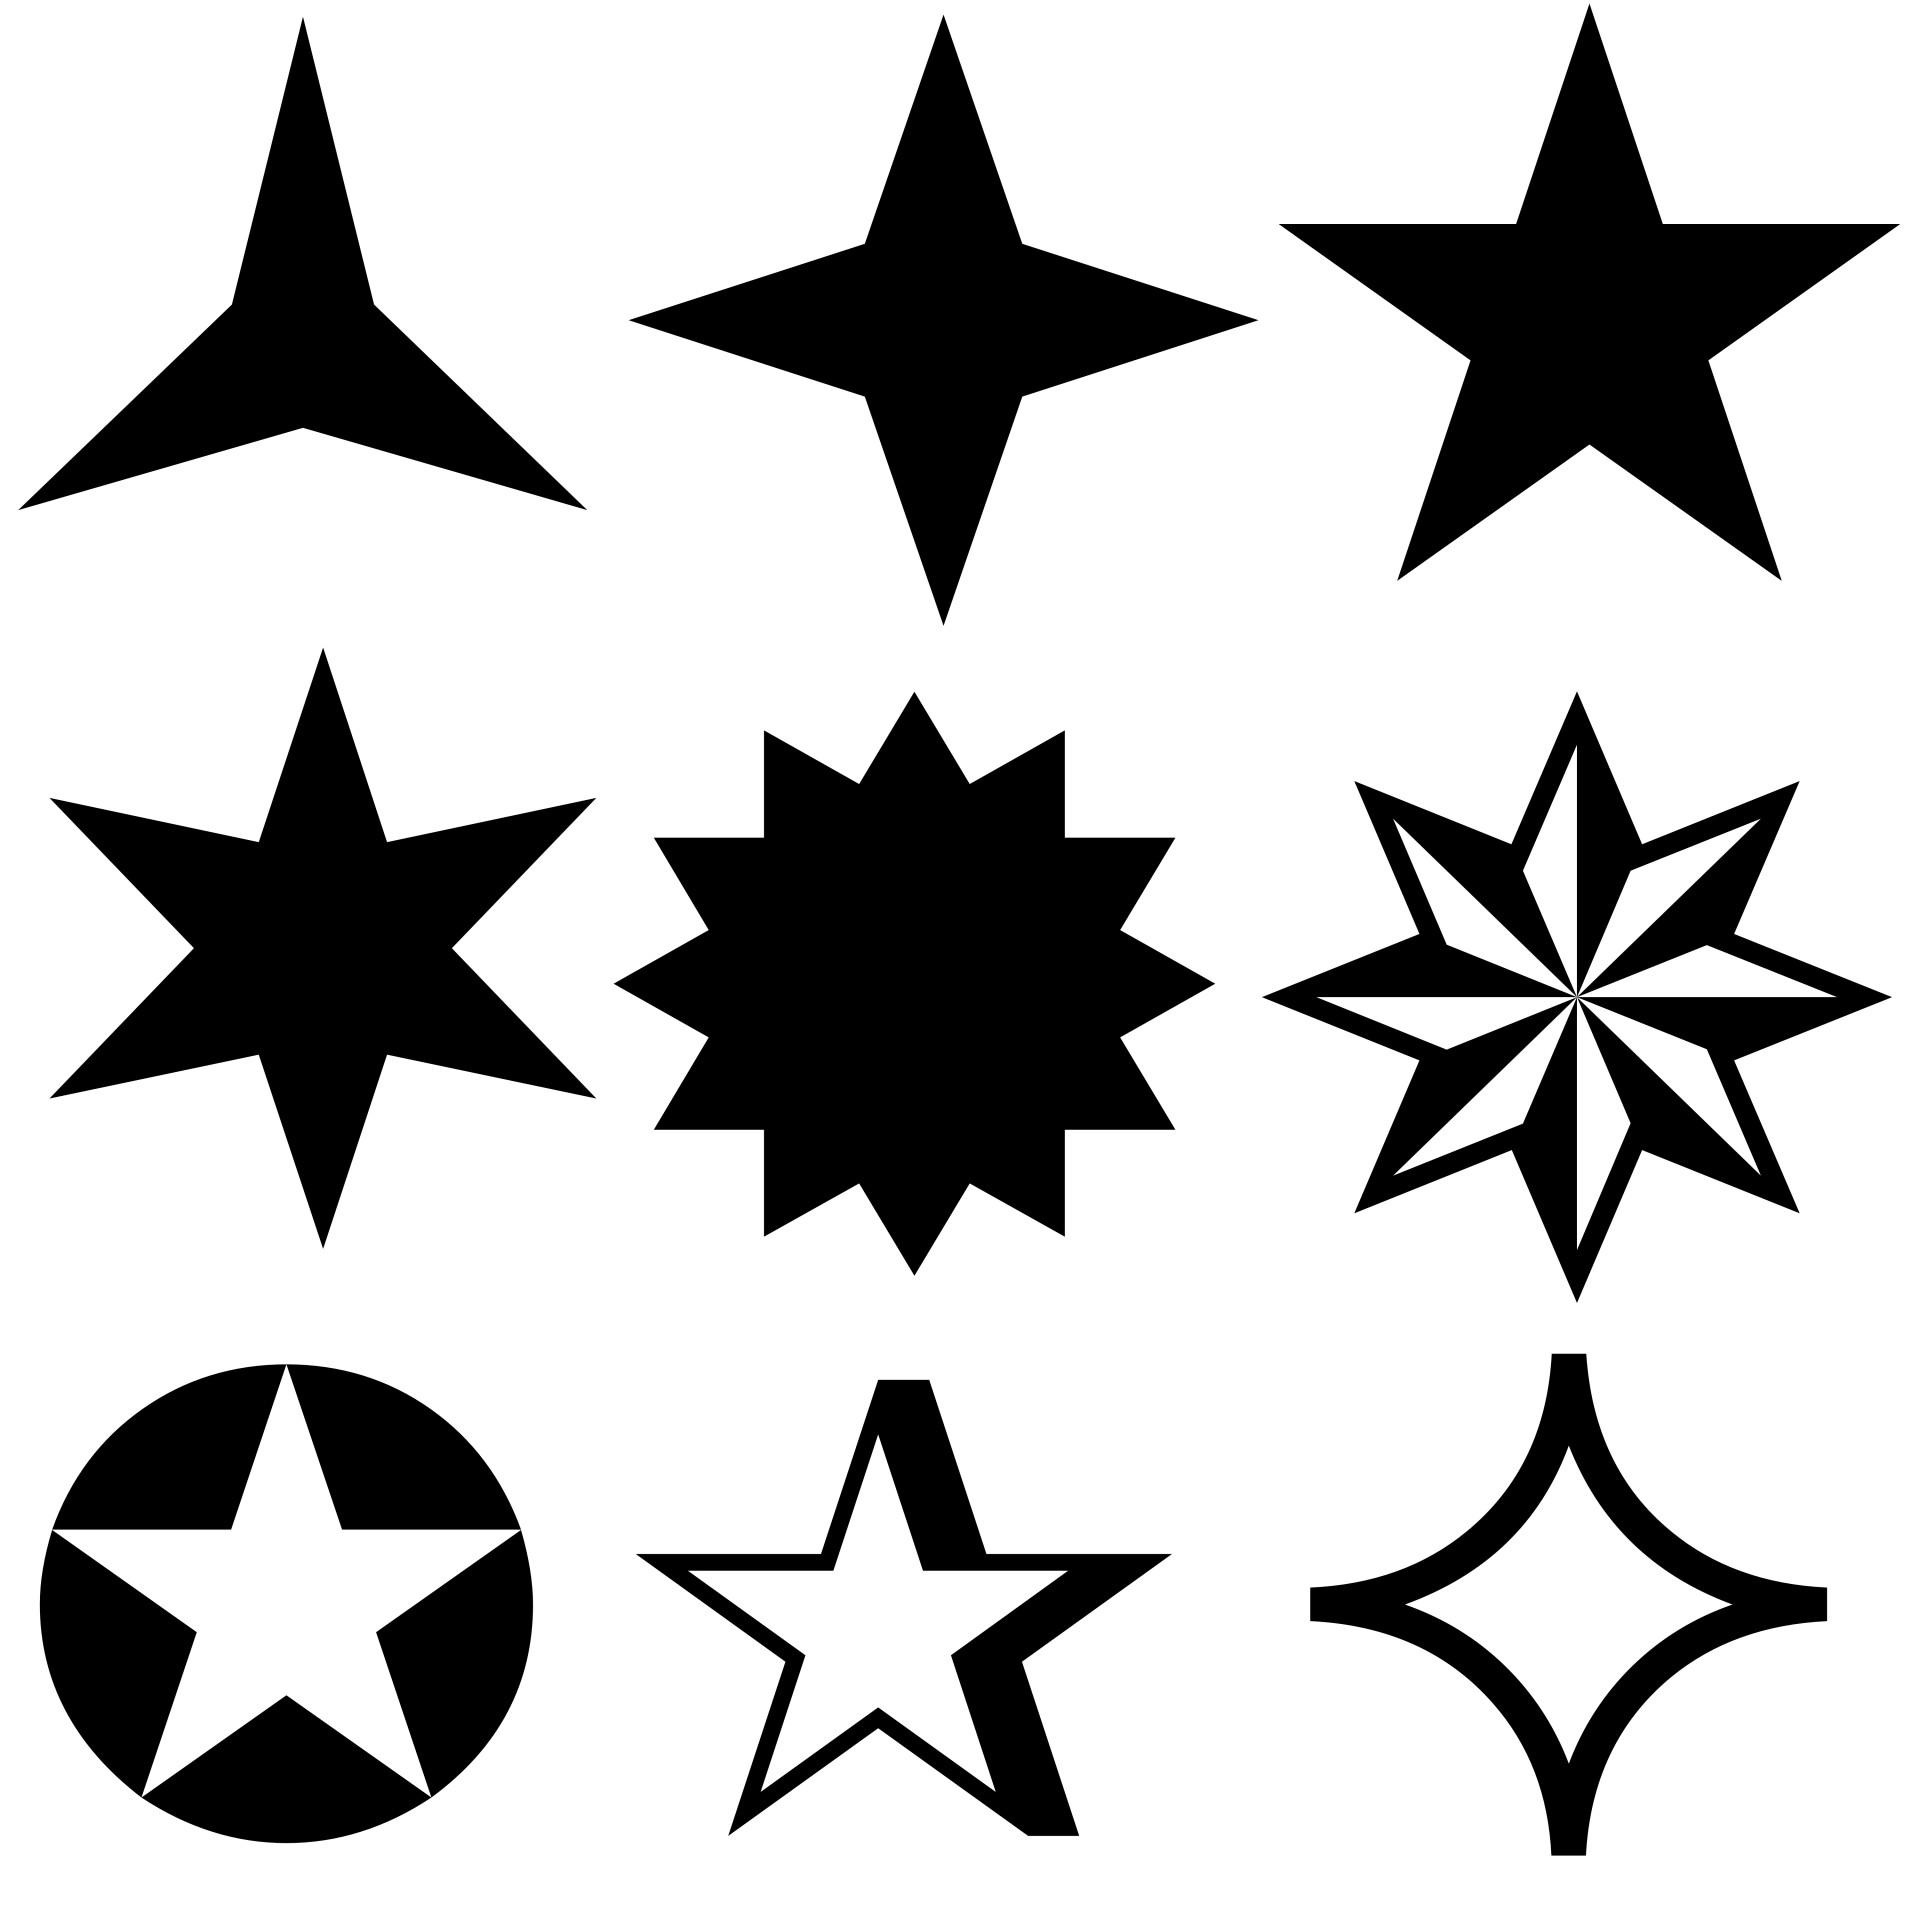 Stars Symbols Free Stock Photo